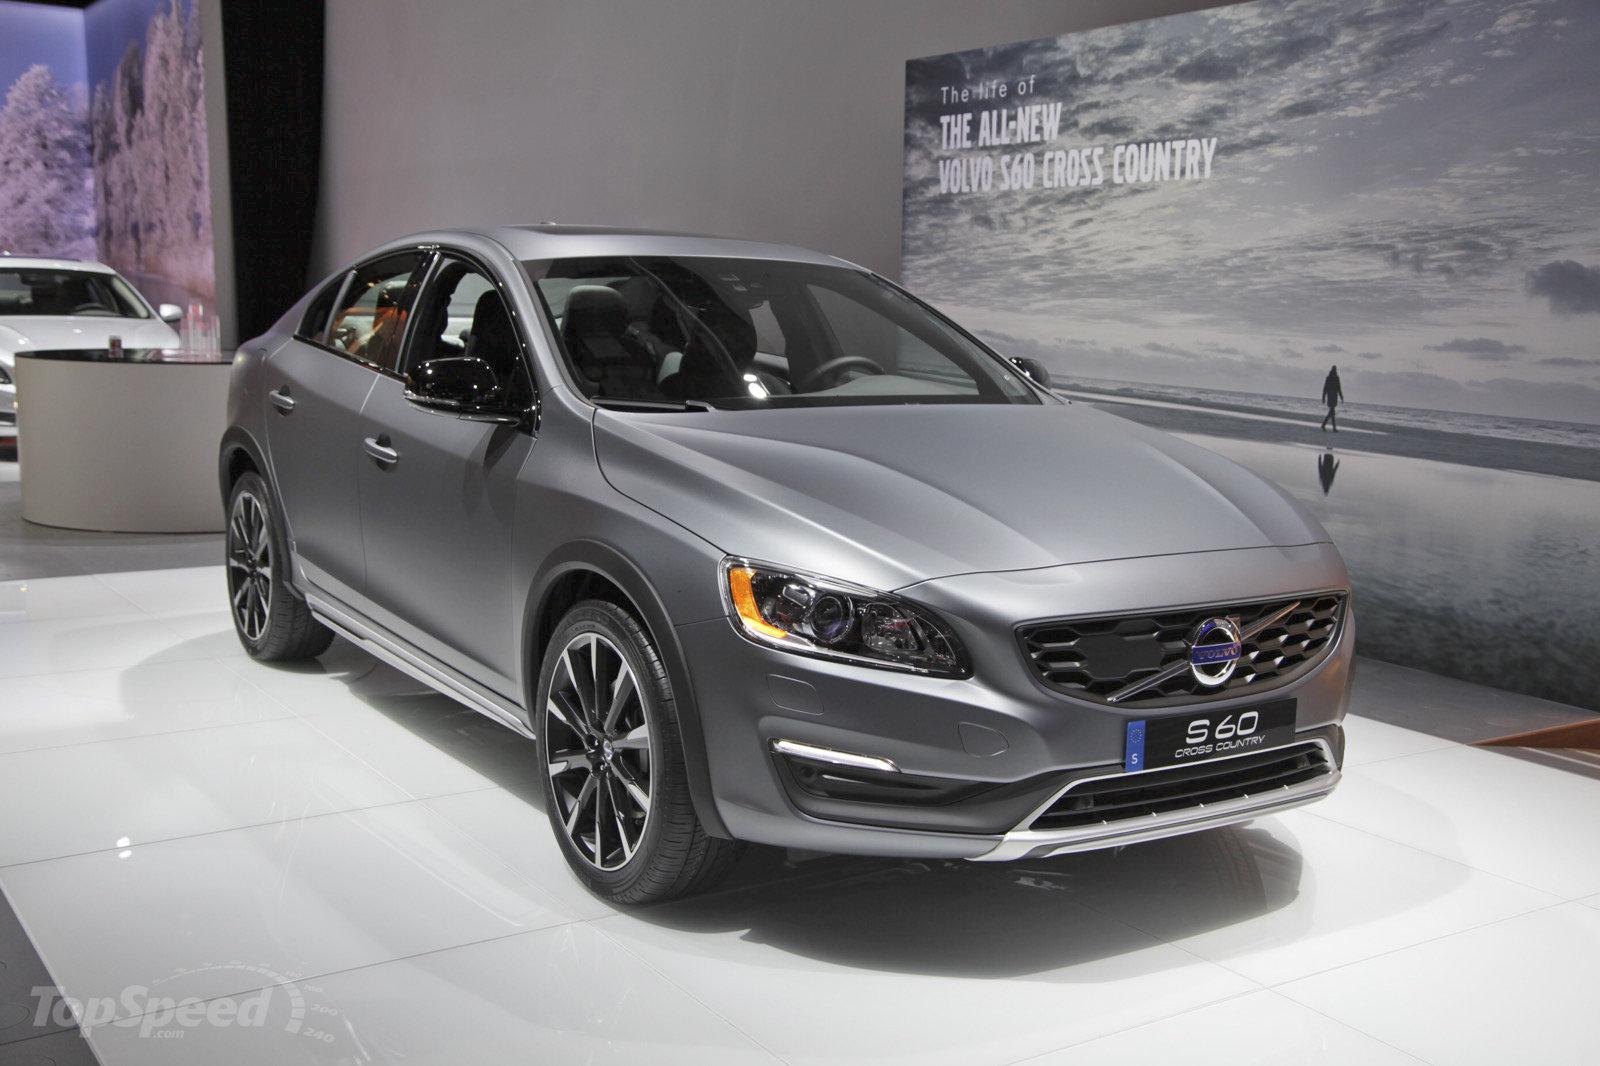 2016 Volvo S60 1 Free Car Hd Wallpaper